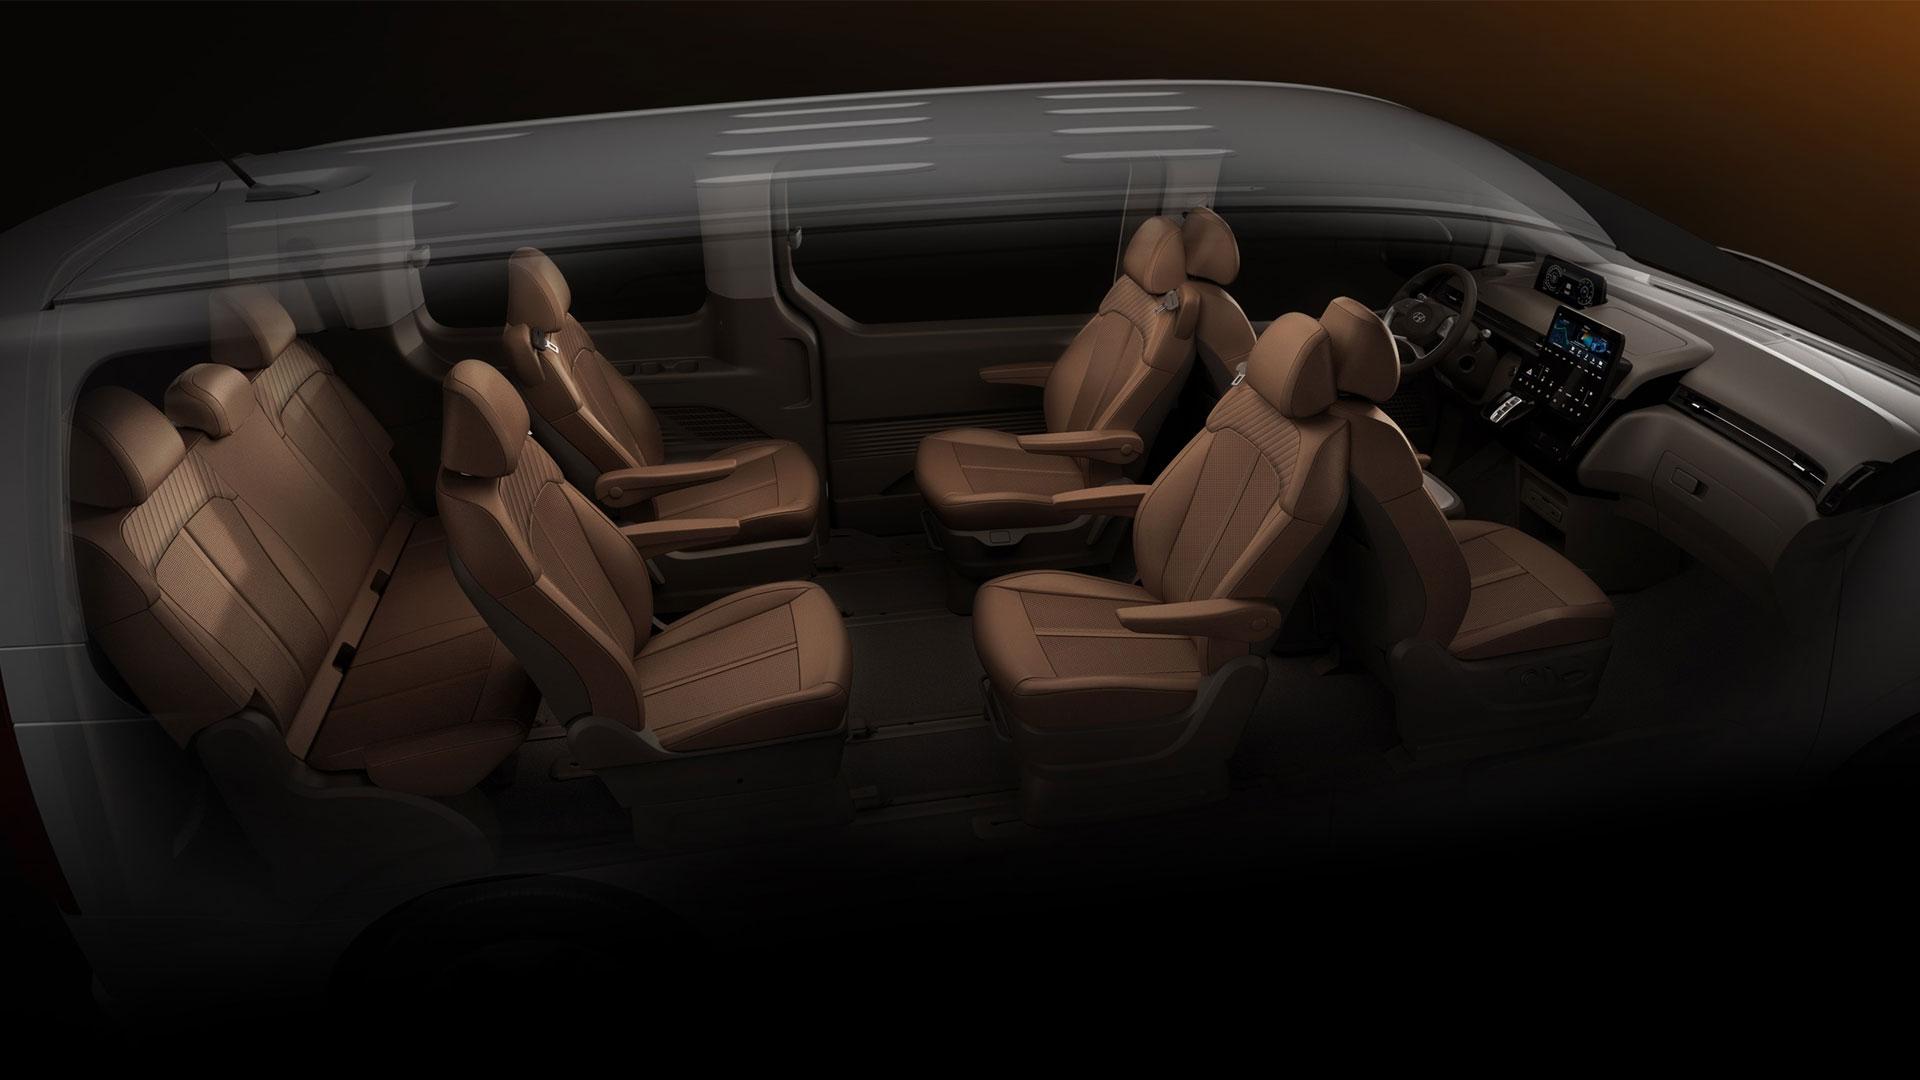 The Hyundai Staria alternative passenger seat setting